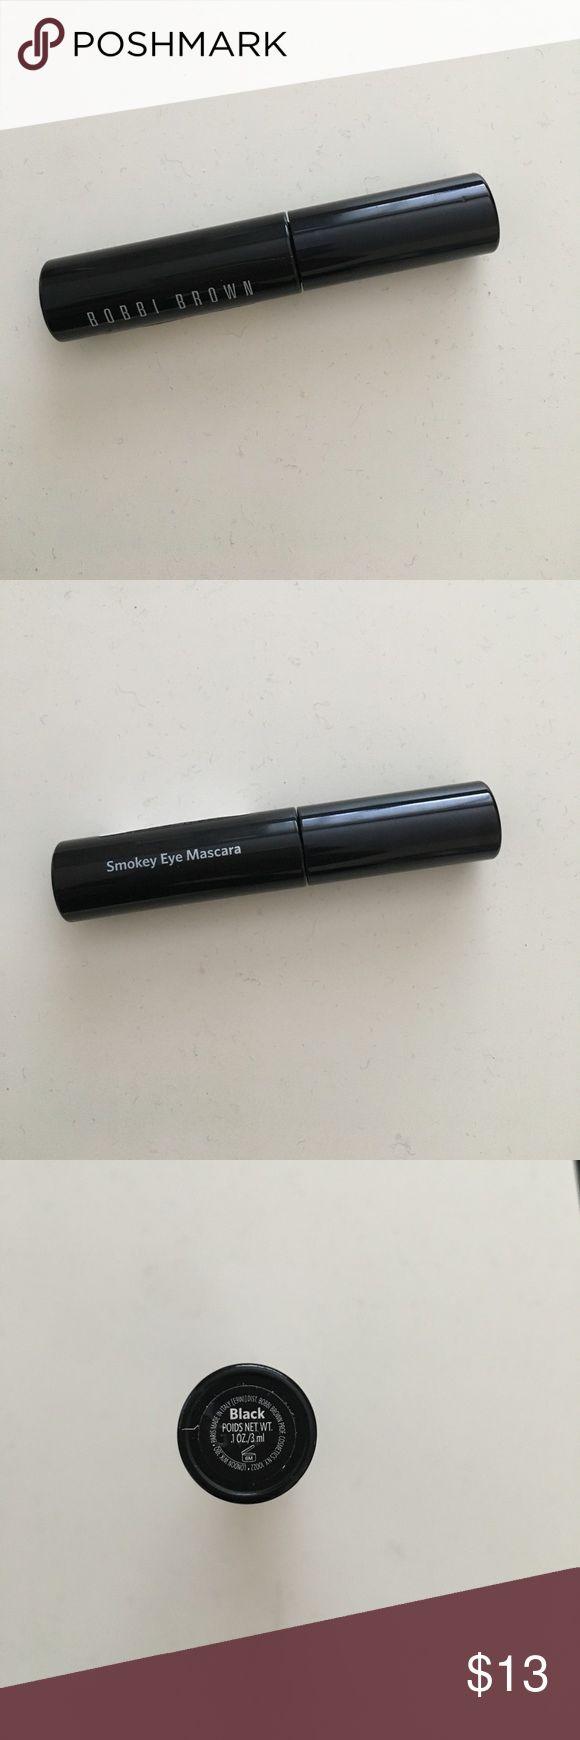 bobbi brown smokey eye mascara 3ml travel size. Brand new Bobbi Brown Makeup Mascara